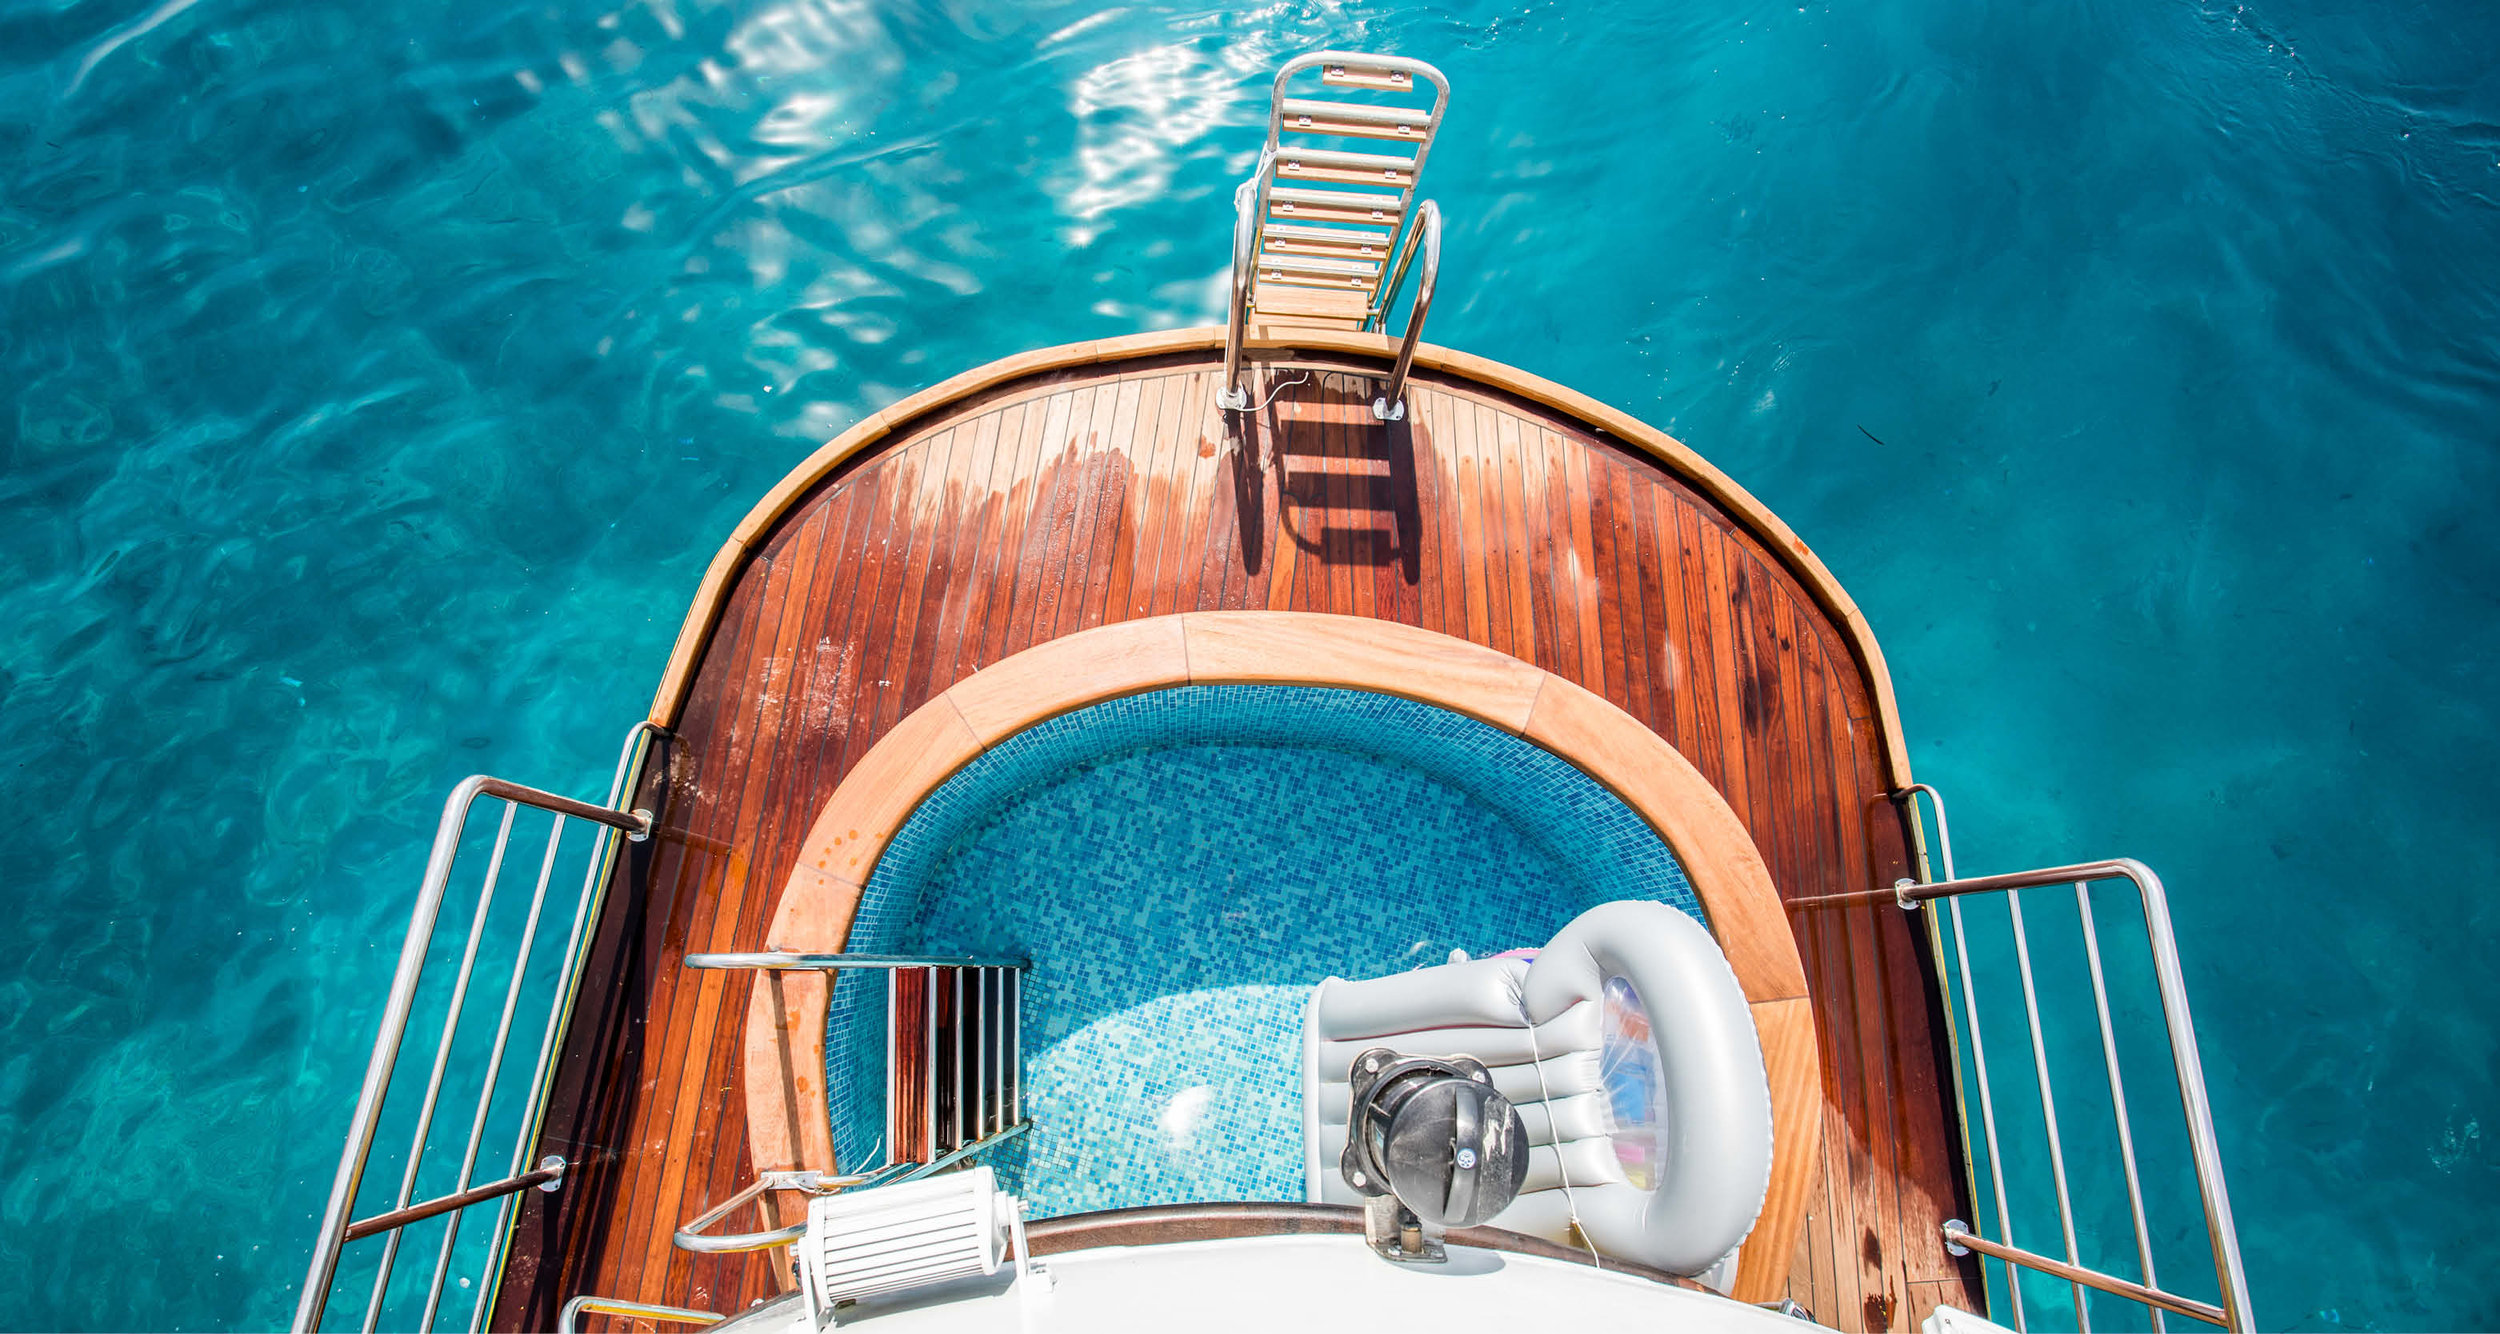 Dream-Maker-Travel-Ship-MS-Arca-Swimming-Deck.jpg